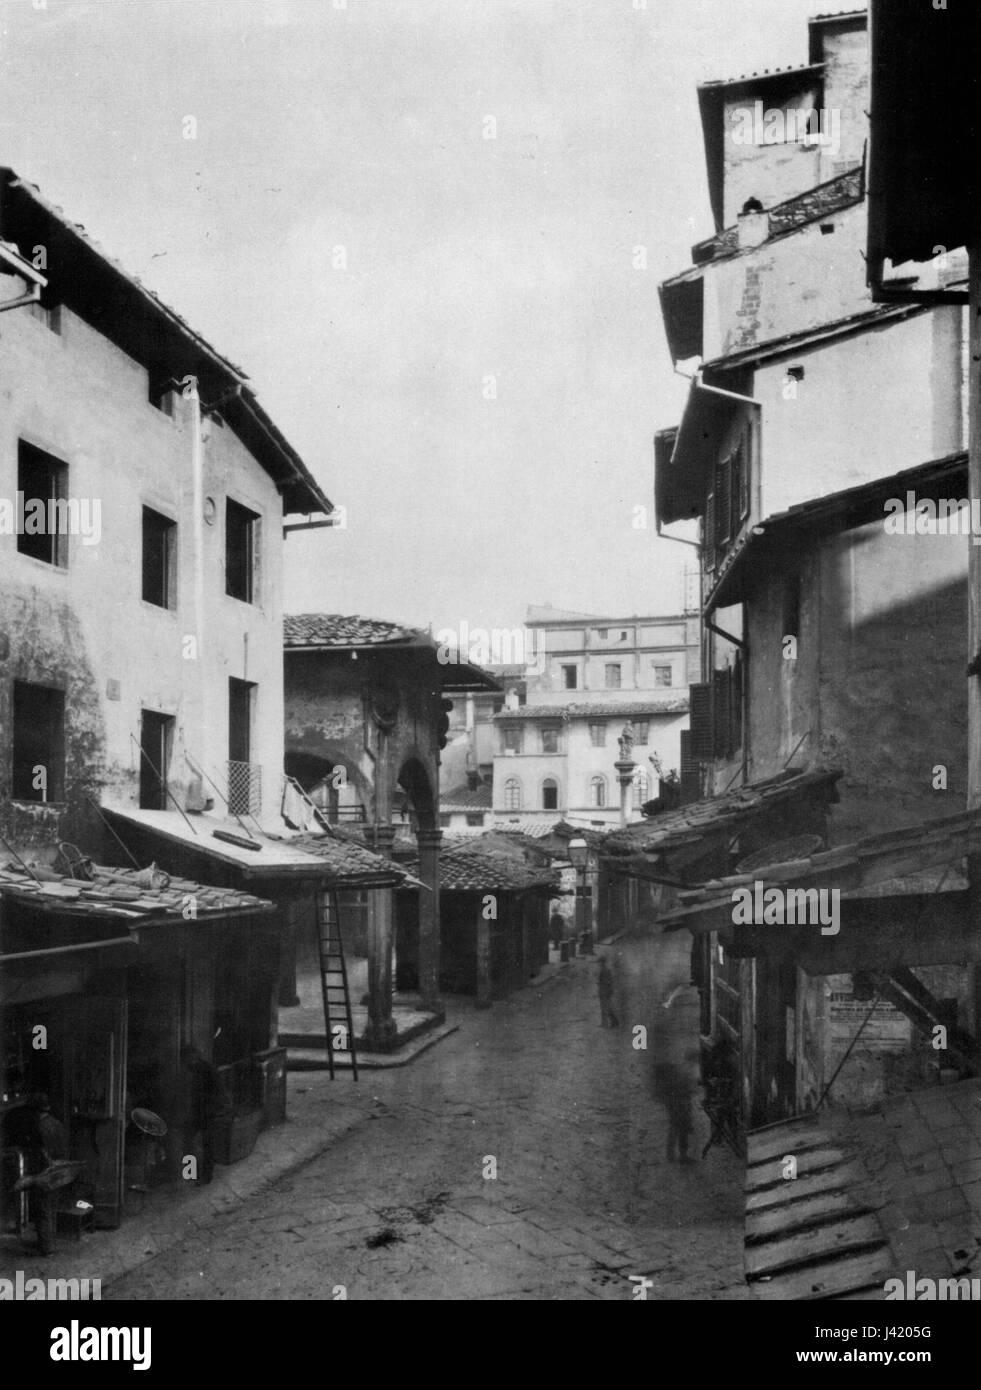 Mercato vecchio before 1881 - Stock Image